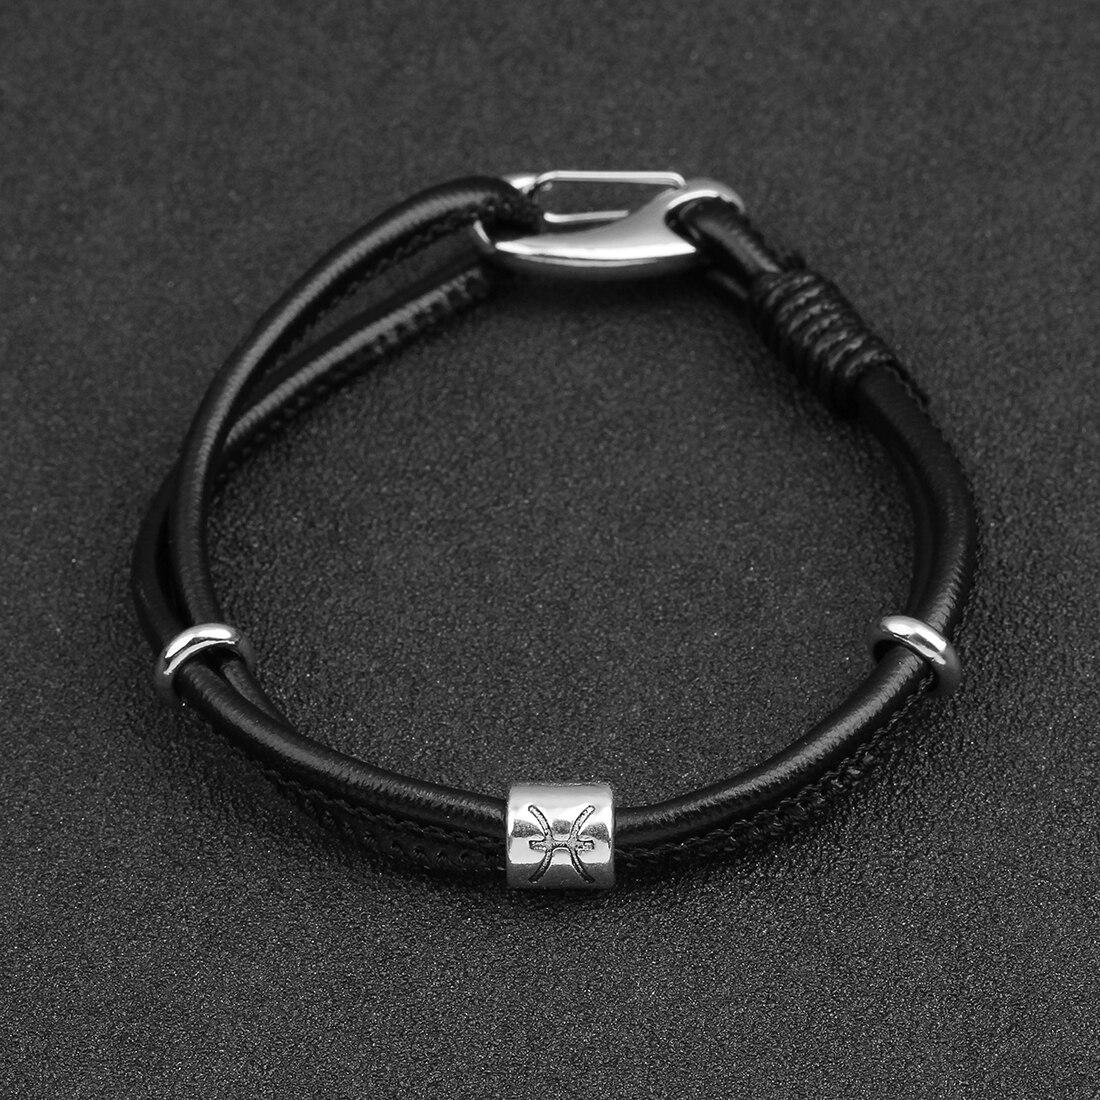 Punk Genuine Constellation Stainless Steel Buckle Leather Bracelet for Women Men Aquarius/Virgo/Scorpio/Libra 12 Zodiac Bracelet